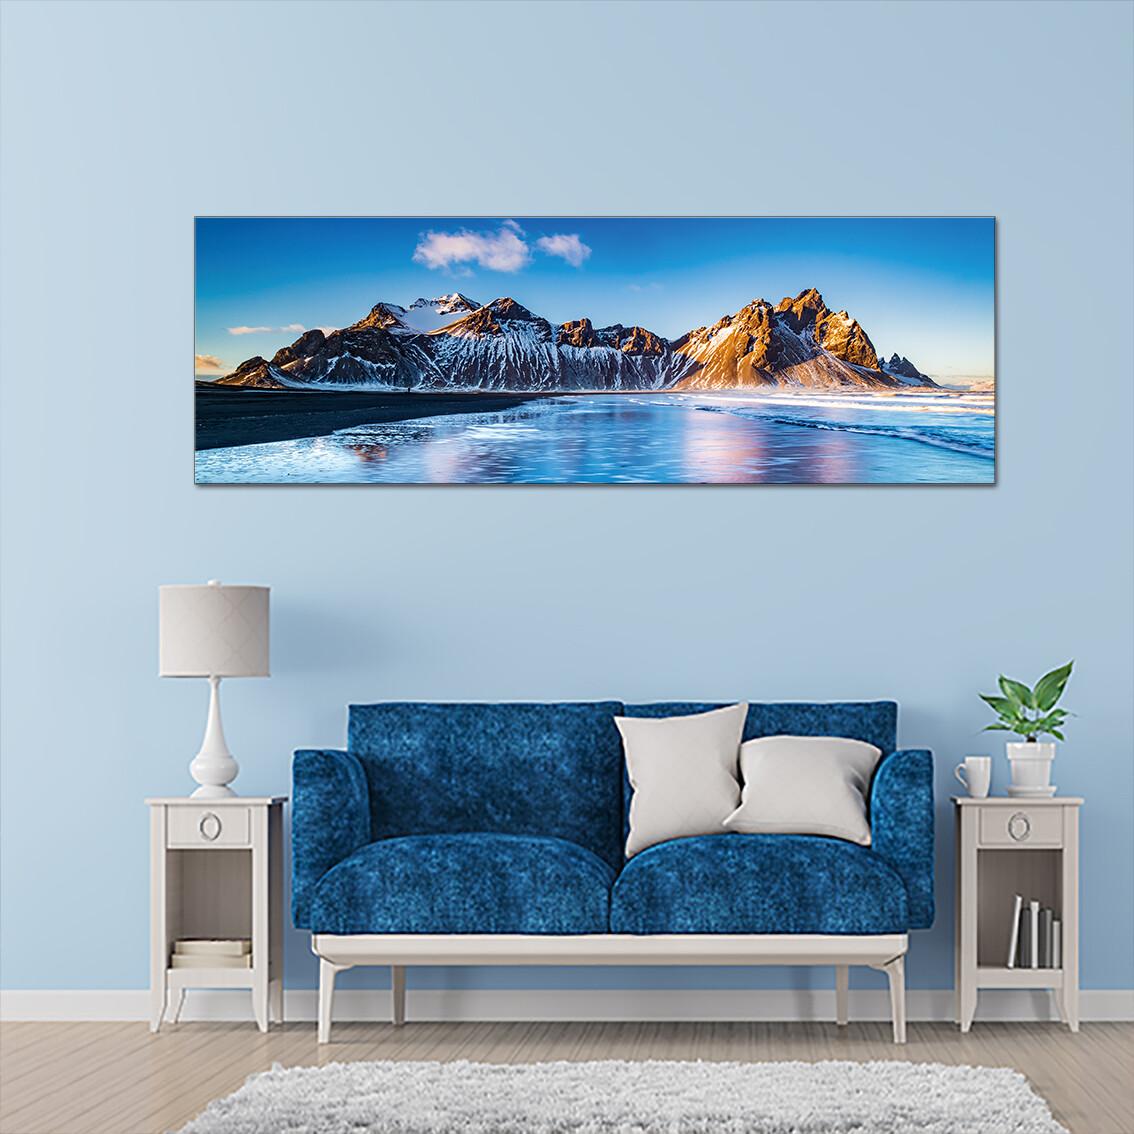 Lake Baikal, Russia  - Modern Luxury Wall art Printed on Acrylic Glass - Frameless and Ready to Hang